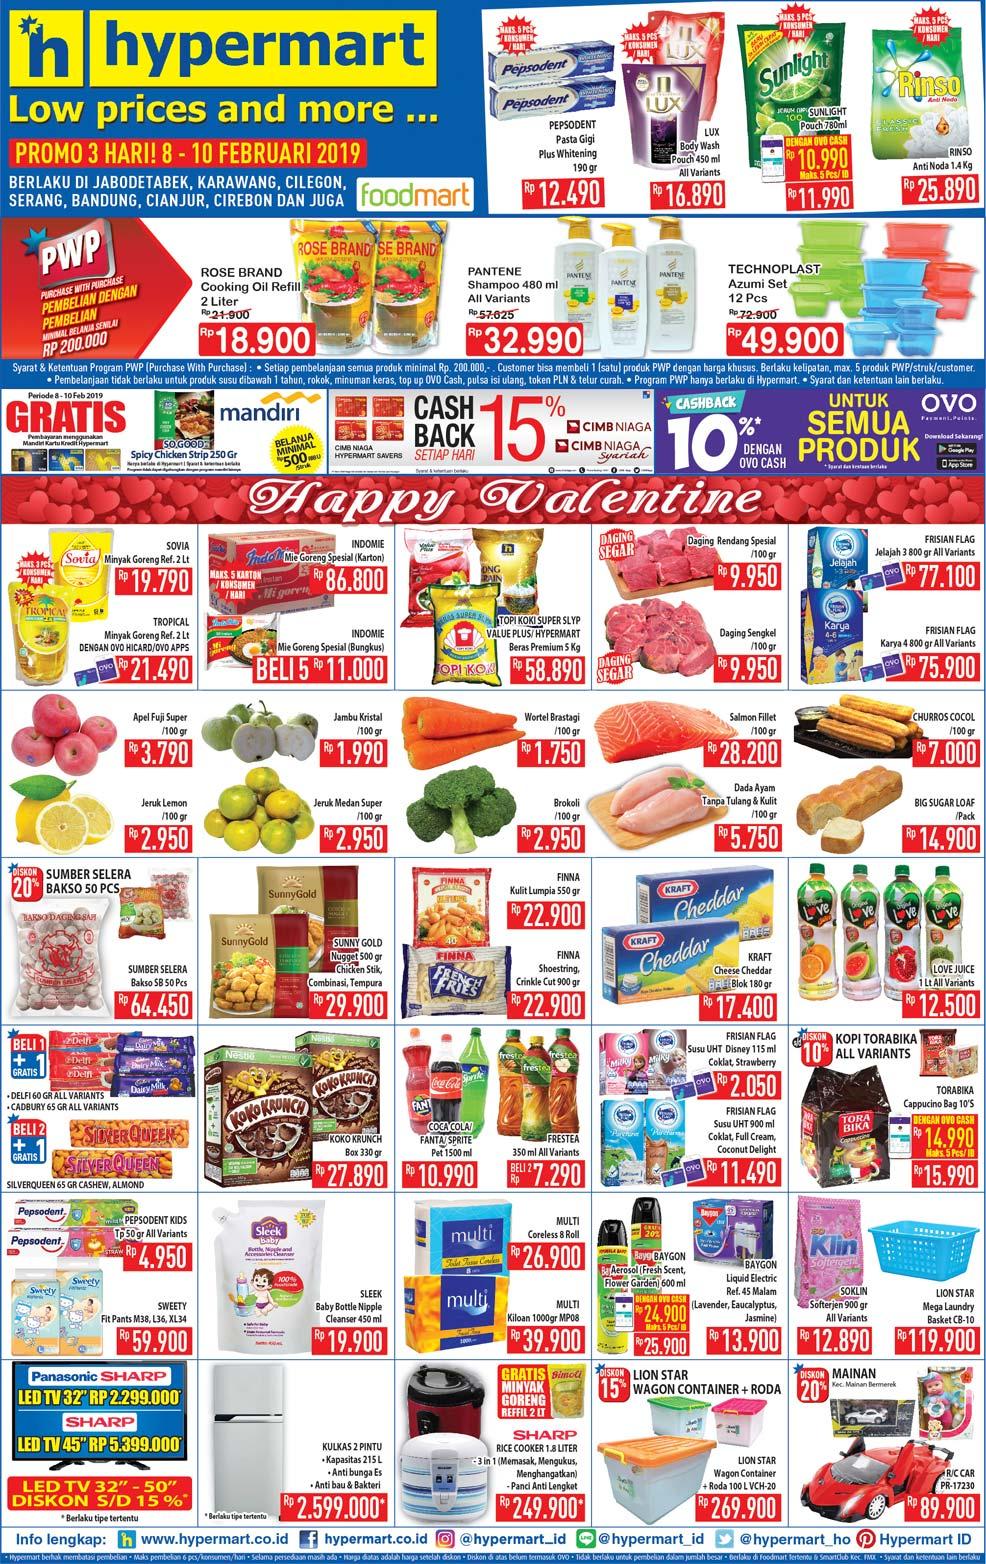 #Hypermart - #Promo #Katalog JSM Periode 08 - 10 Februari 2019